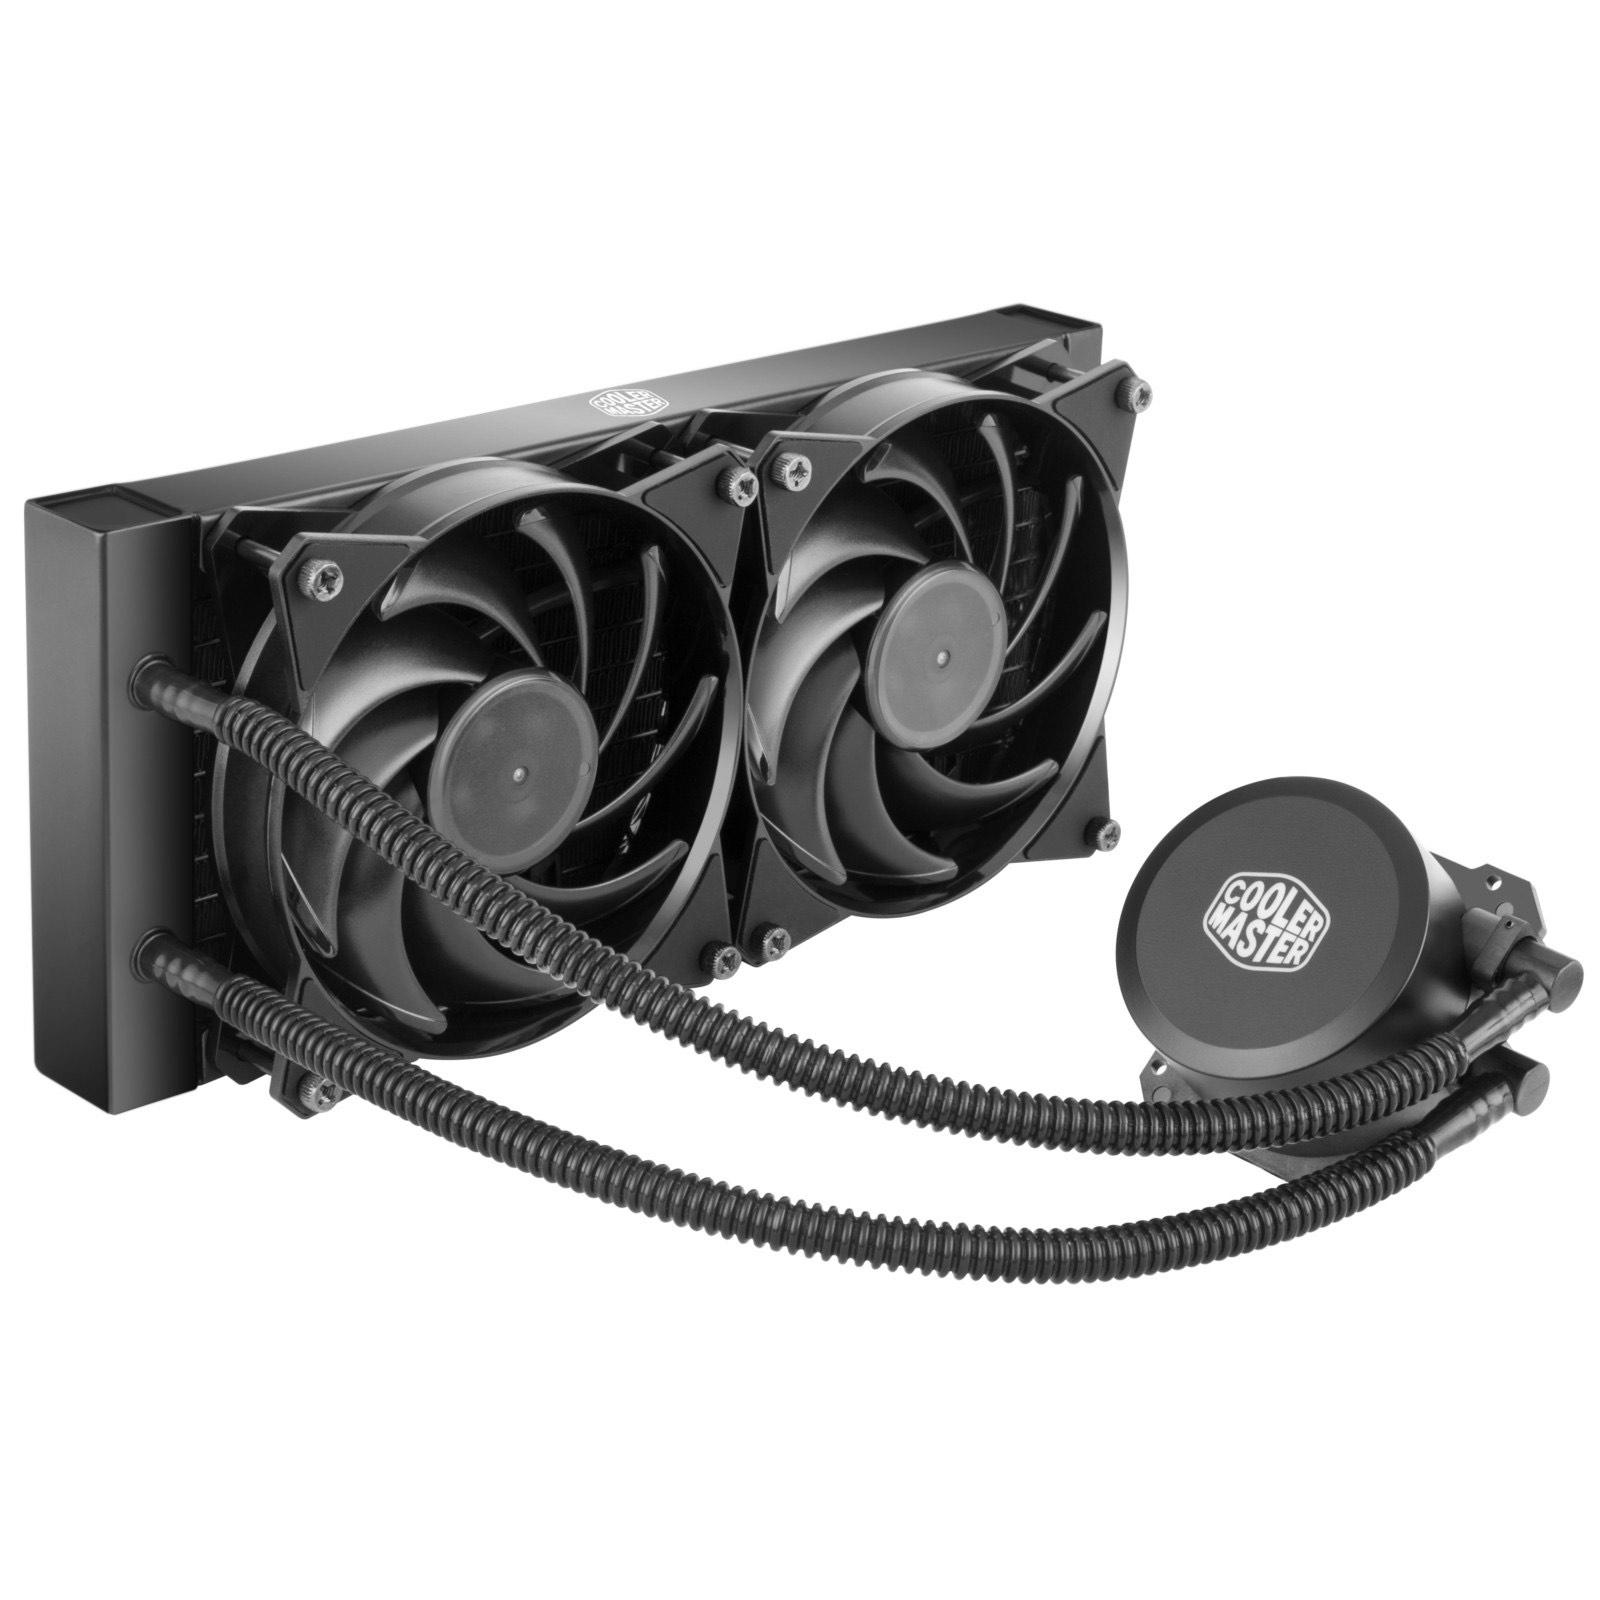 CoolerMaster MasterLiquid CPU Cooler 240 £48.38 (UK Mainland) Sold by Amazon EU @ Amazon